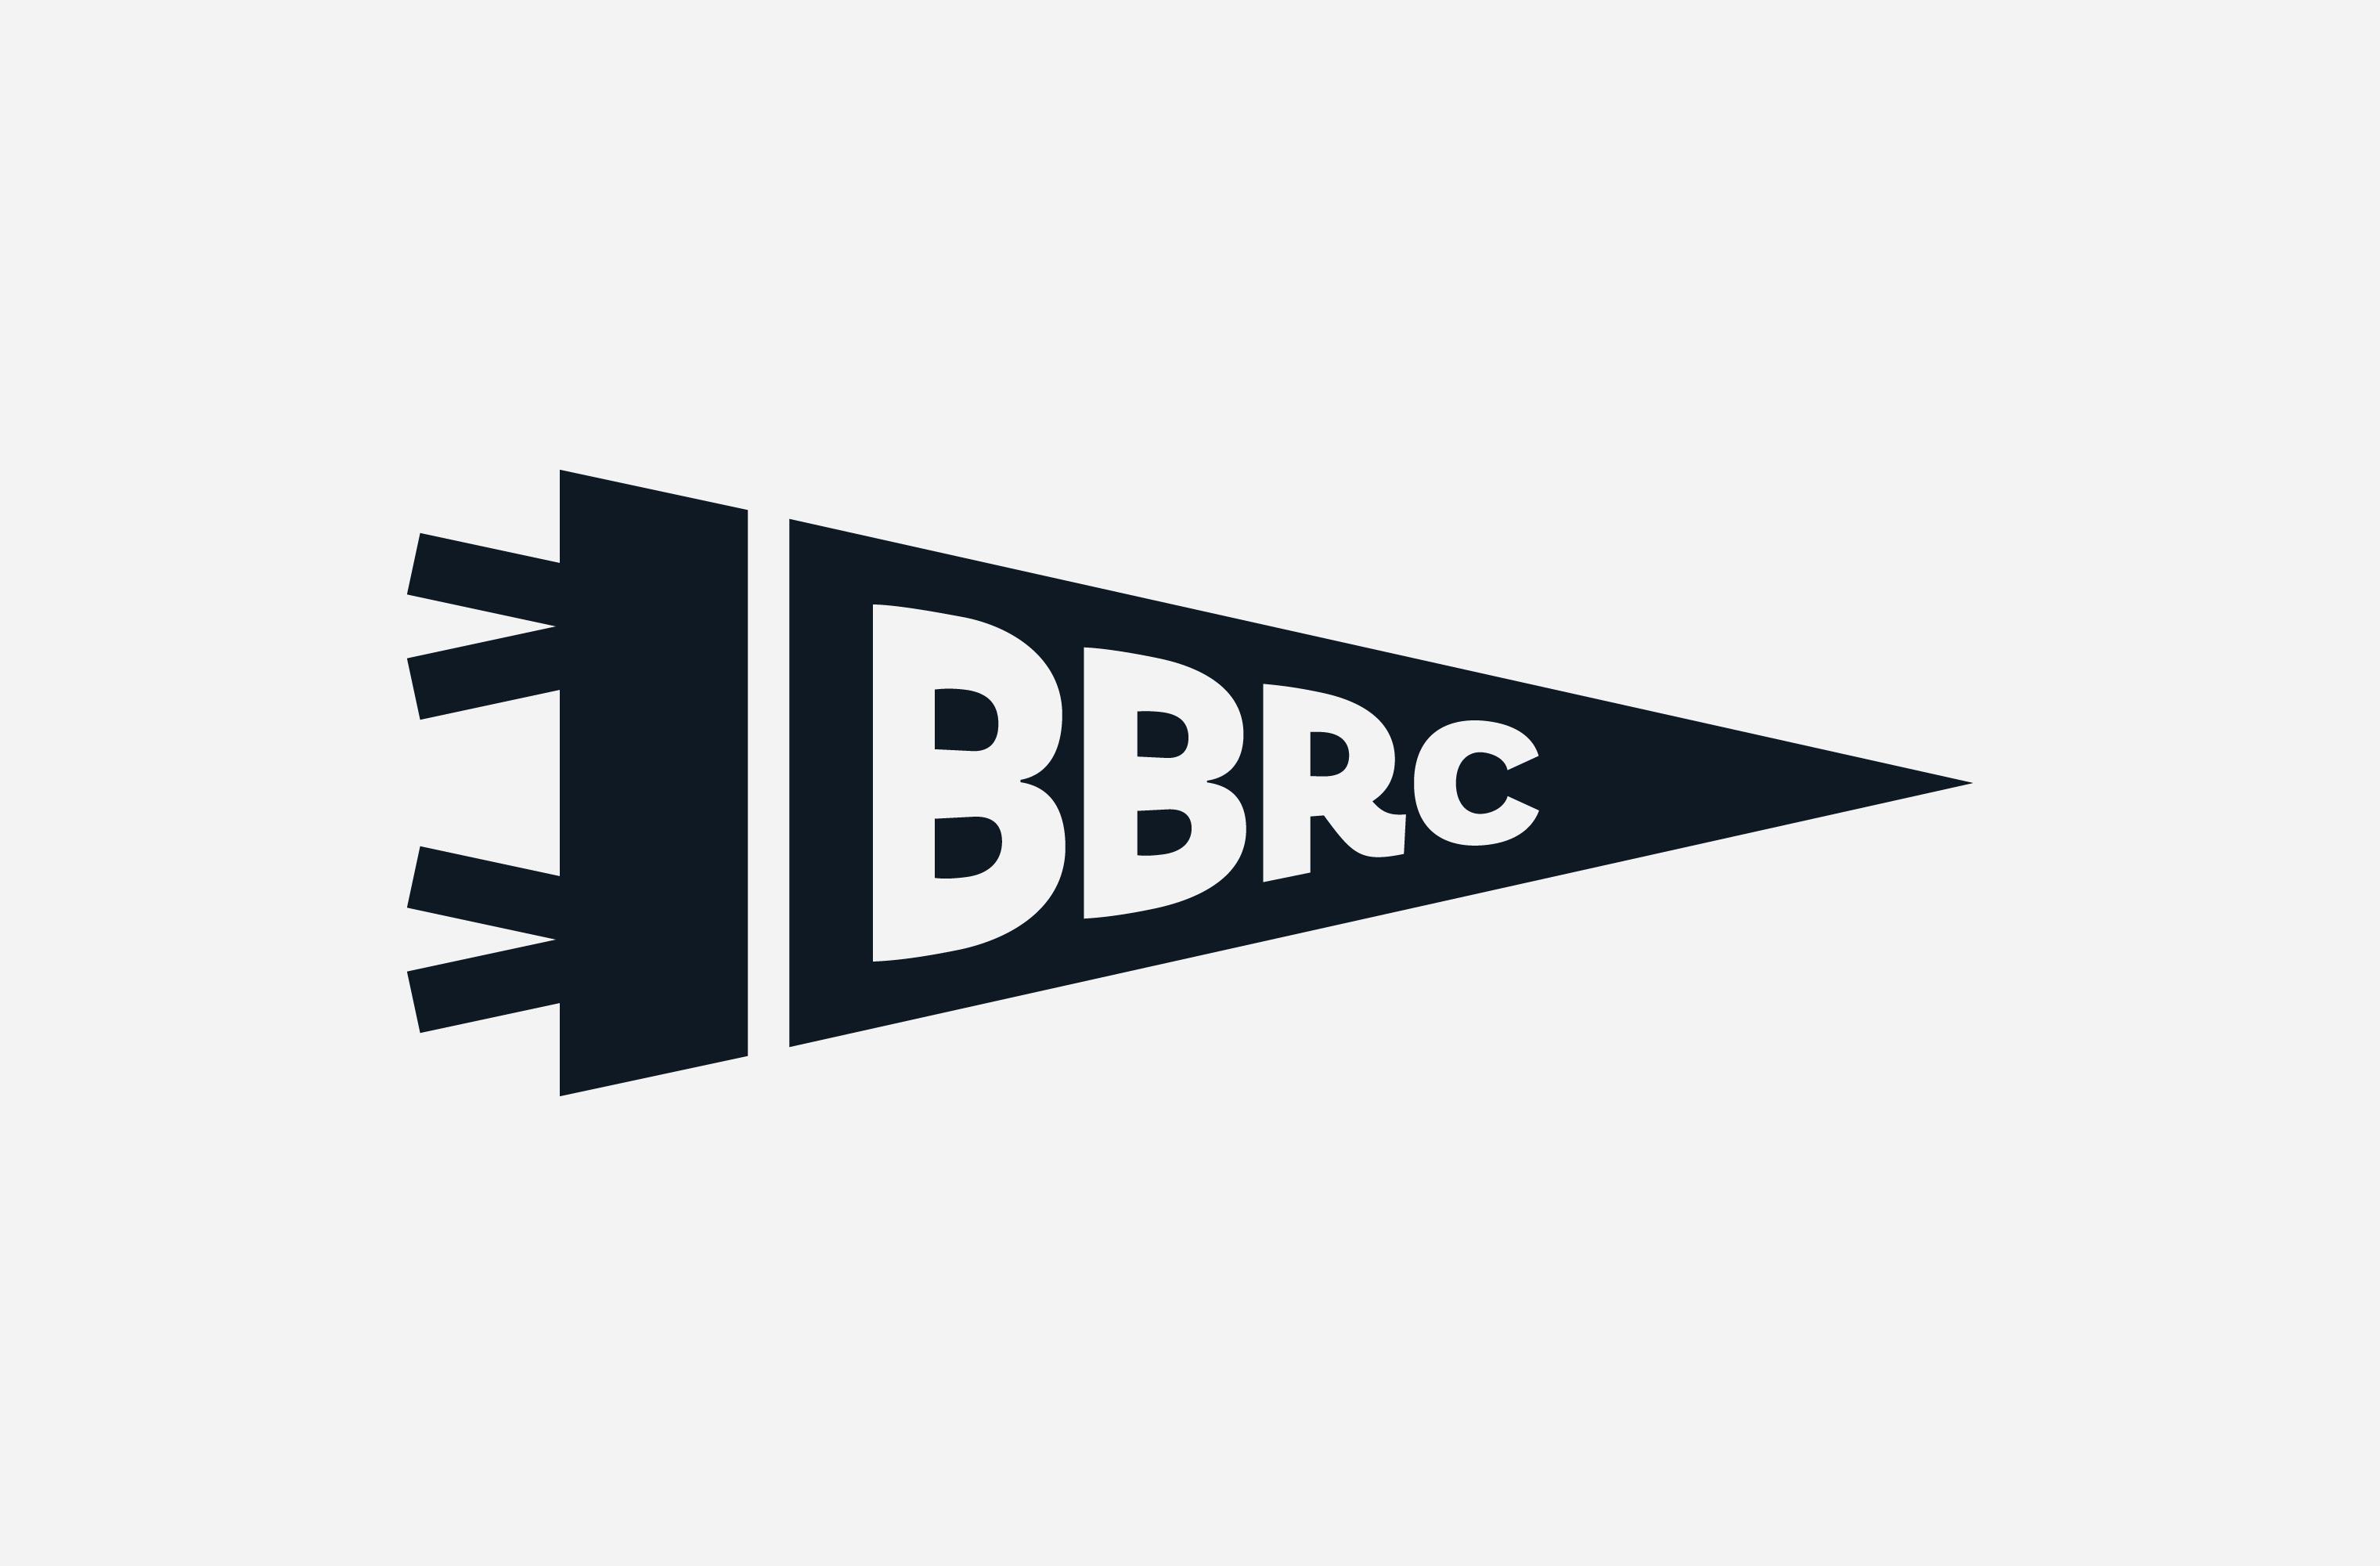 Pennant illustration featuring a BBRC monogram, created for Back Bay Run Club